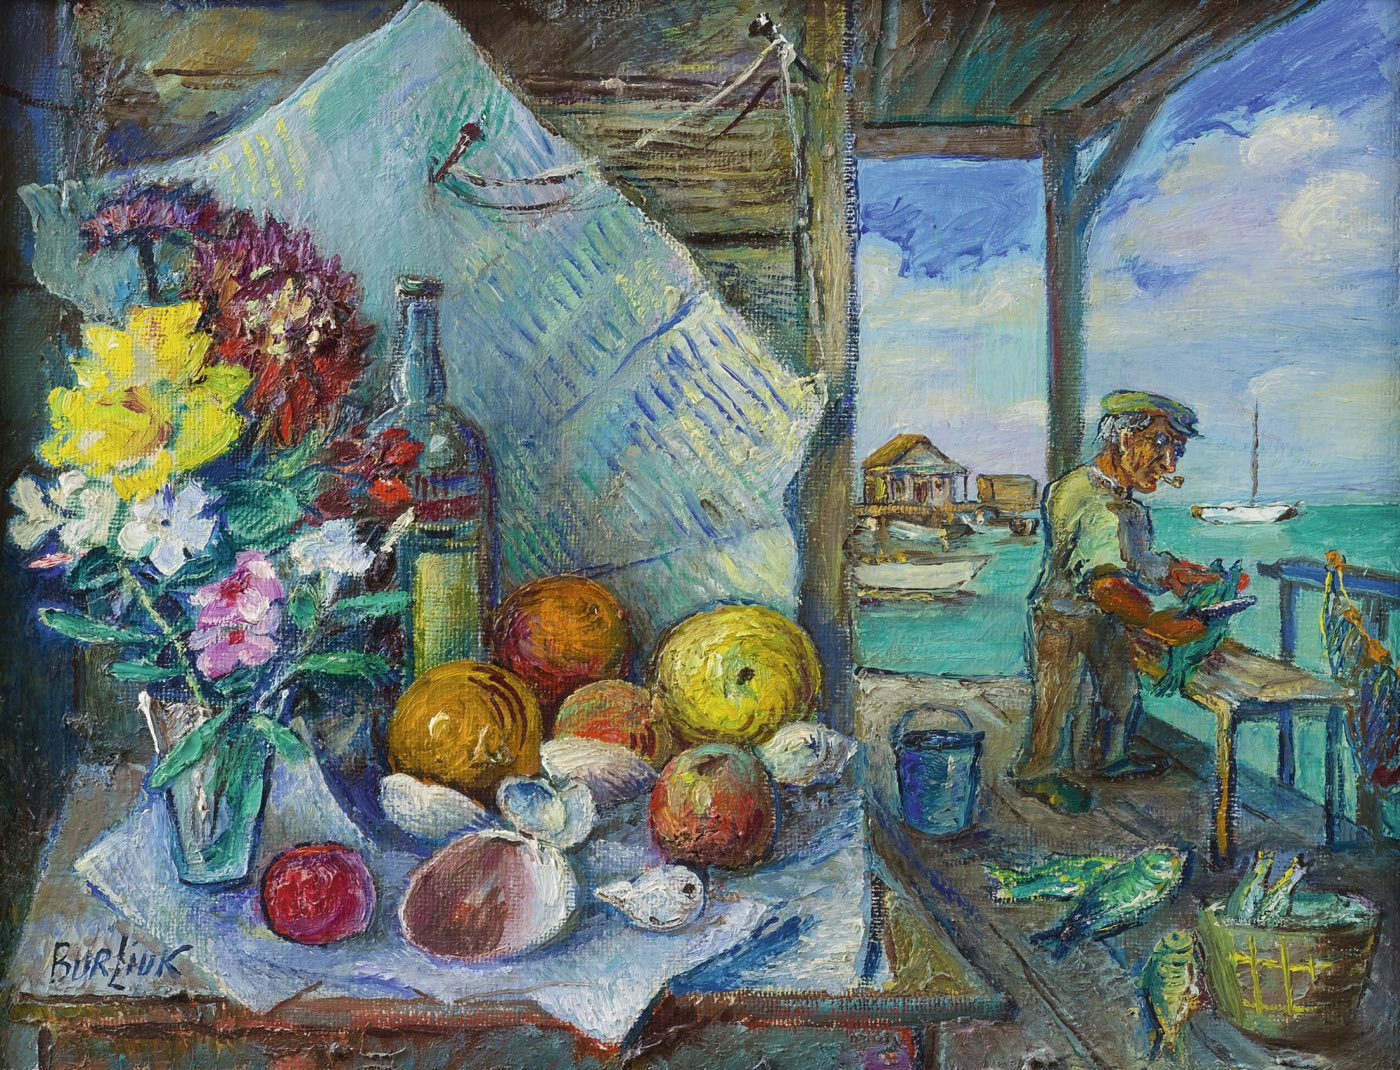 La fiesta del pescador (siglo XX), de David Burliuk